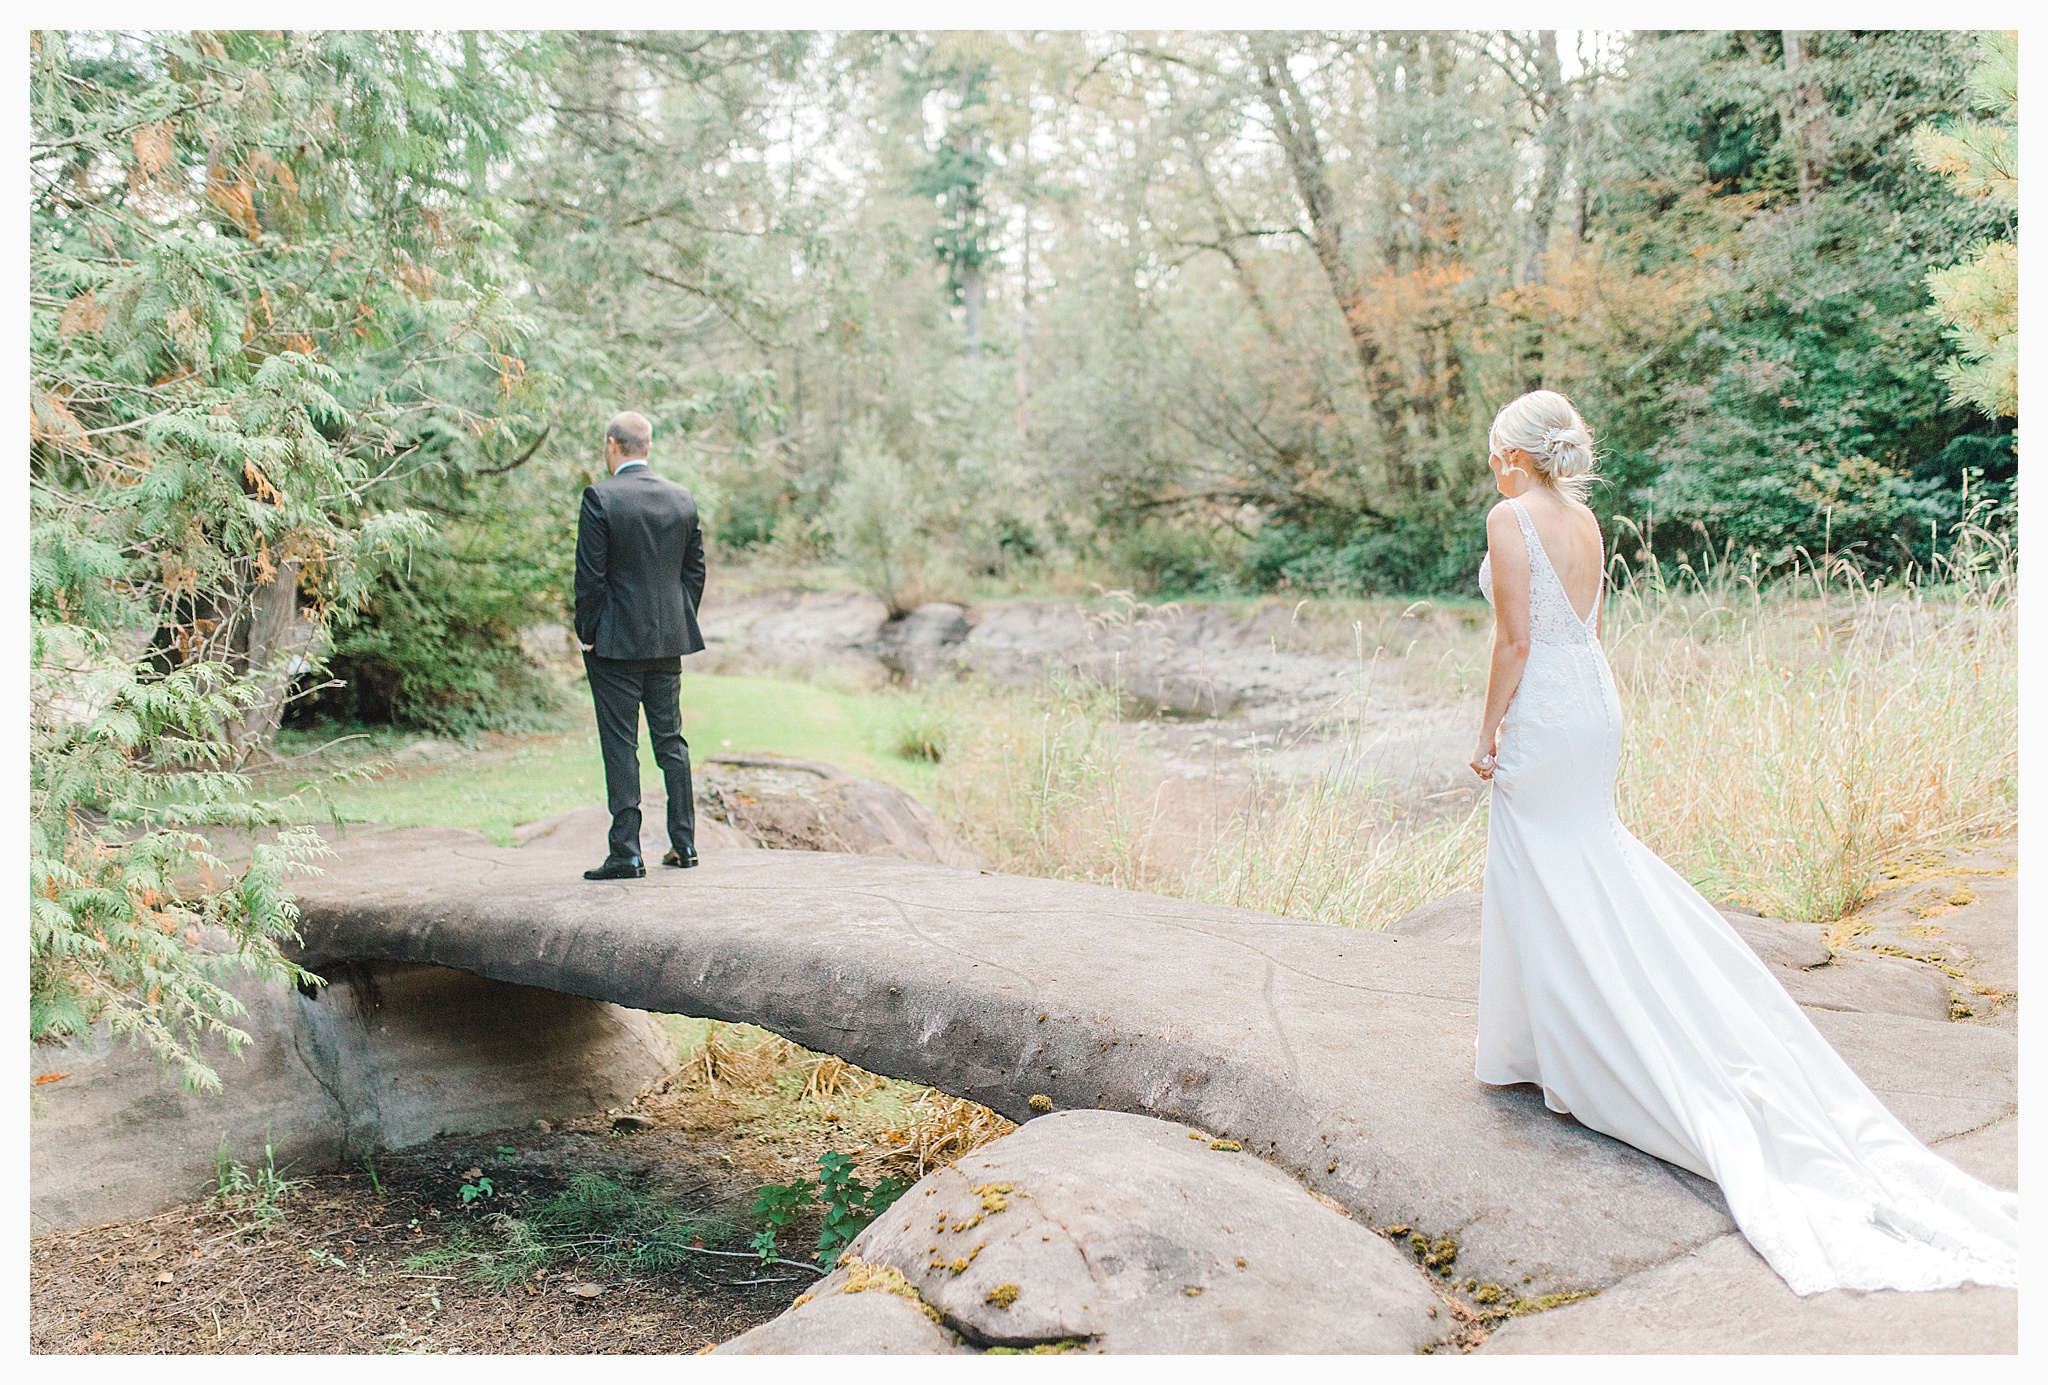 Emma Rose Company Light and Airy Wedding Photographer, Beautiful fall wedding at Rock Creek Gardens Venue in Puyallup, Washington._0022.jpg